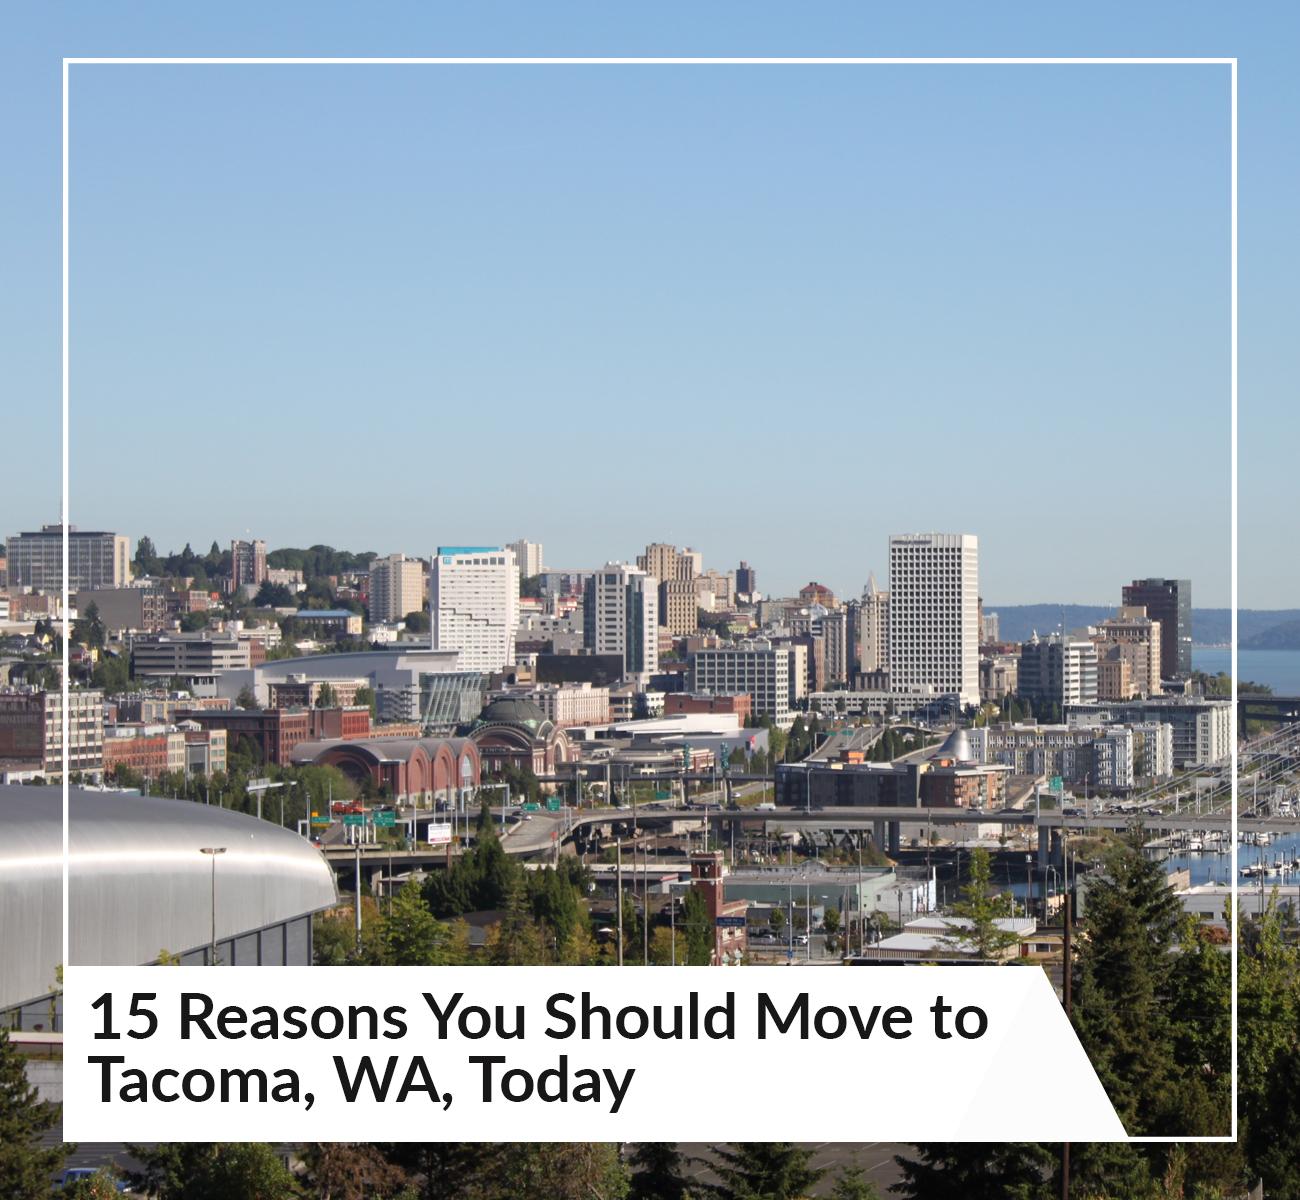 Moving To Tacoma, WA